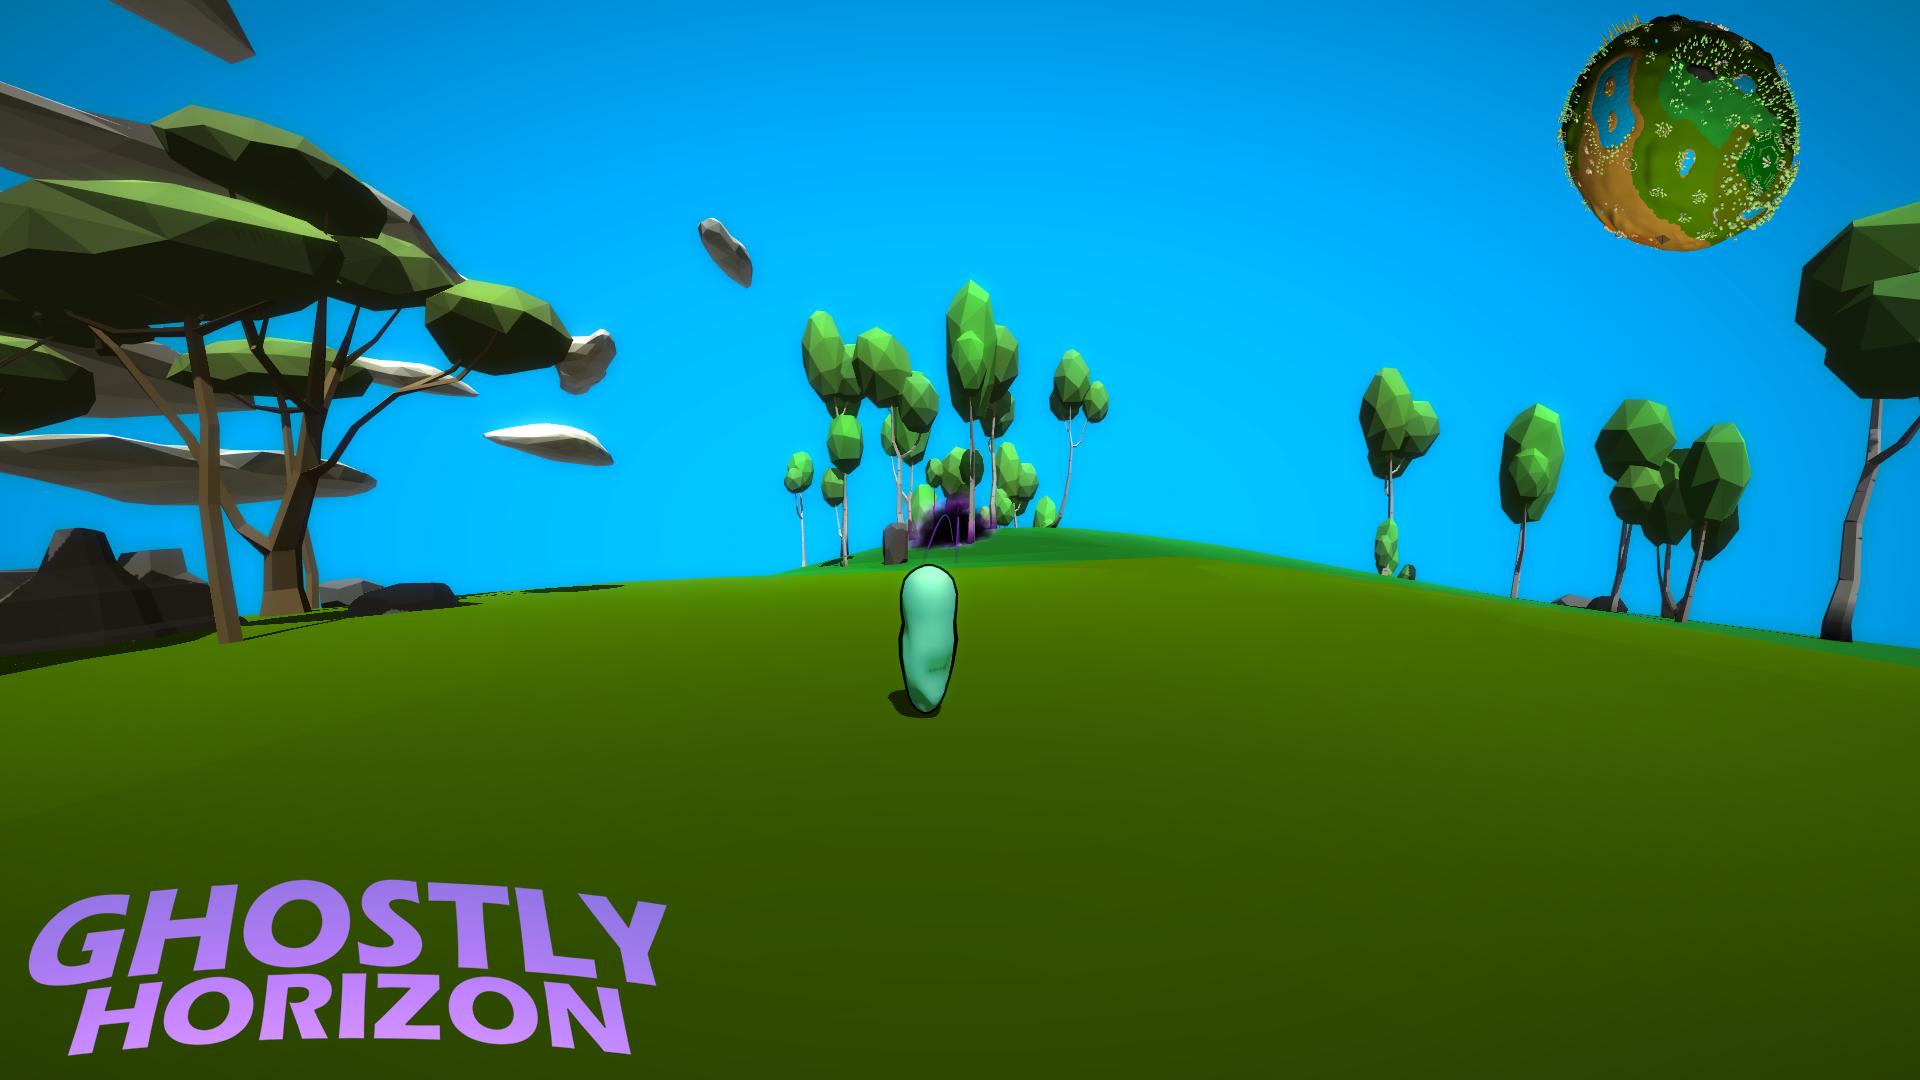 Ghostly Horizon - Ecto casting dark mist